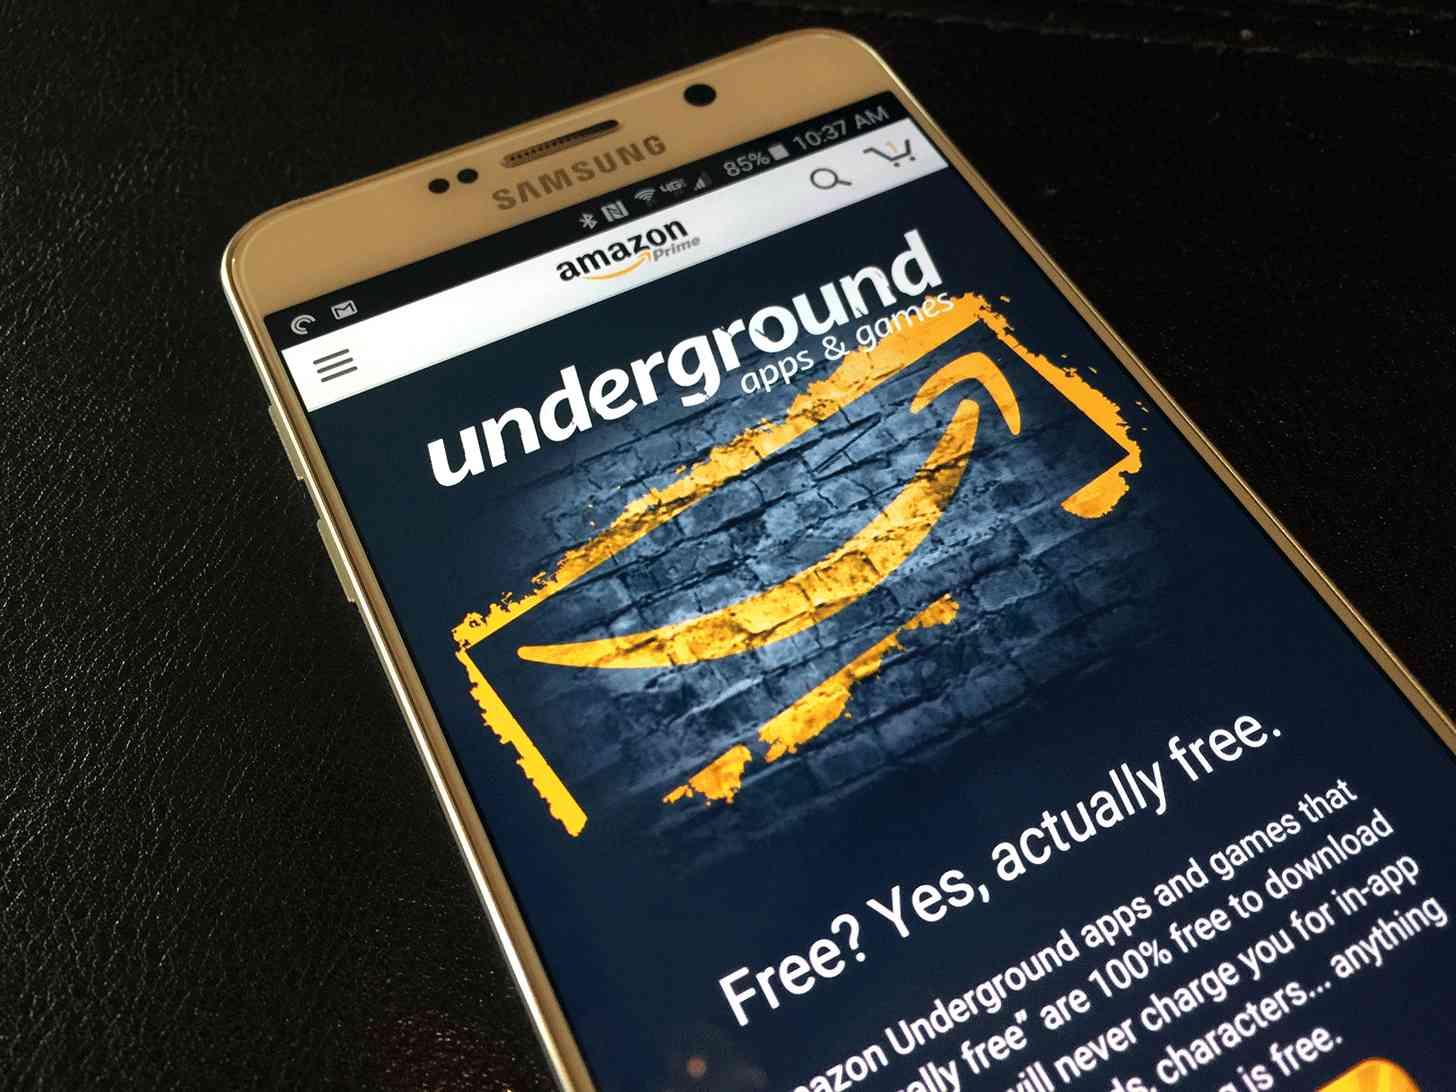 Amazon Underground Android app